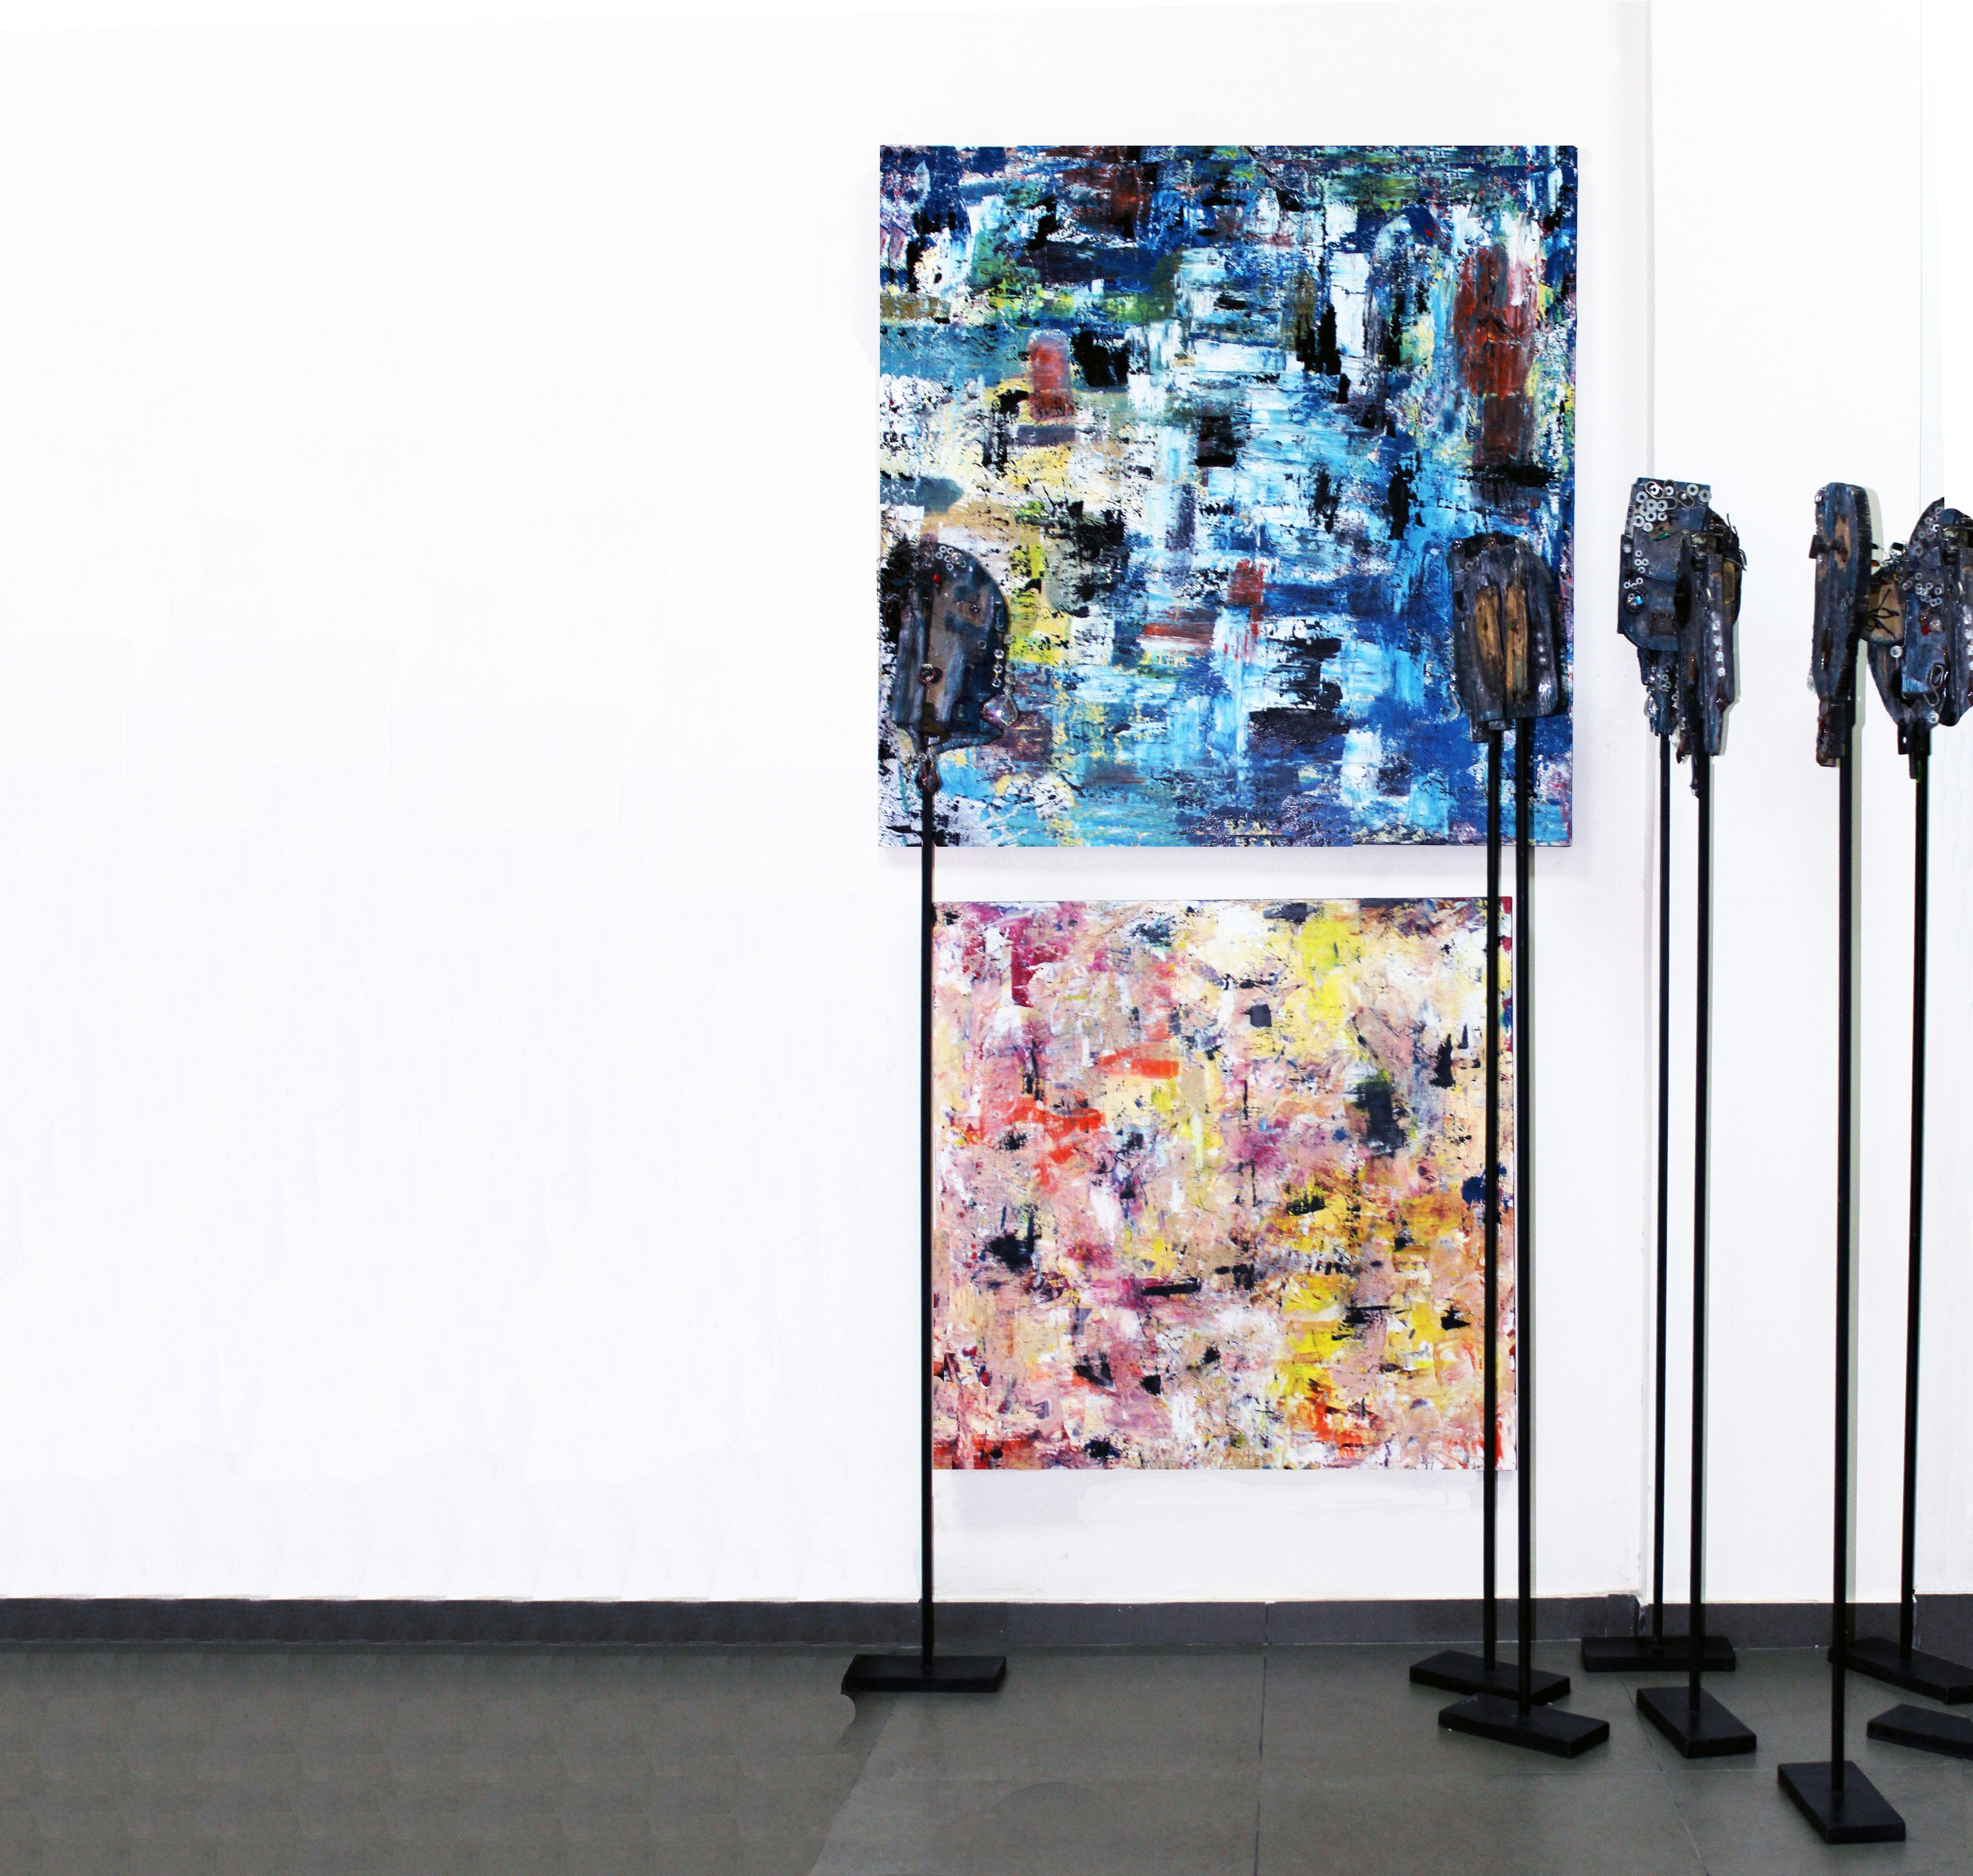 """ESPACES EPHEMERES"" Art Space. www.espacesephemeres.com"